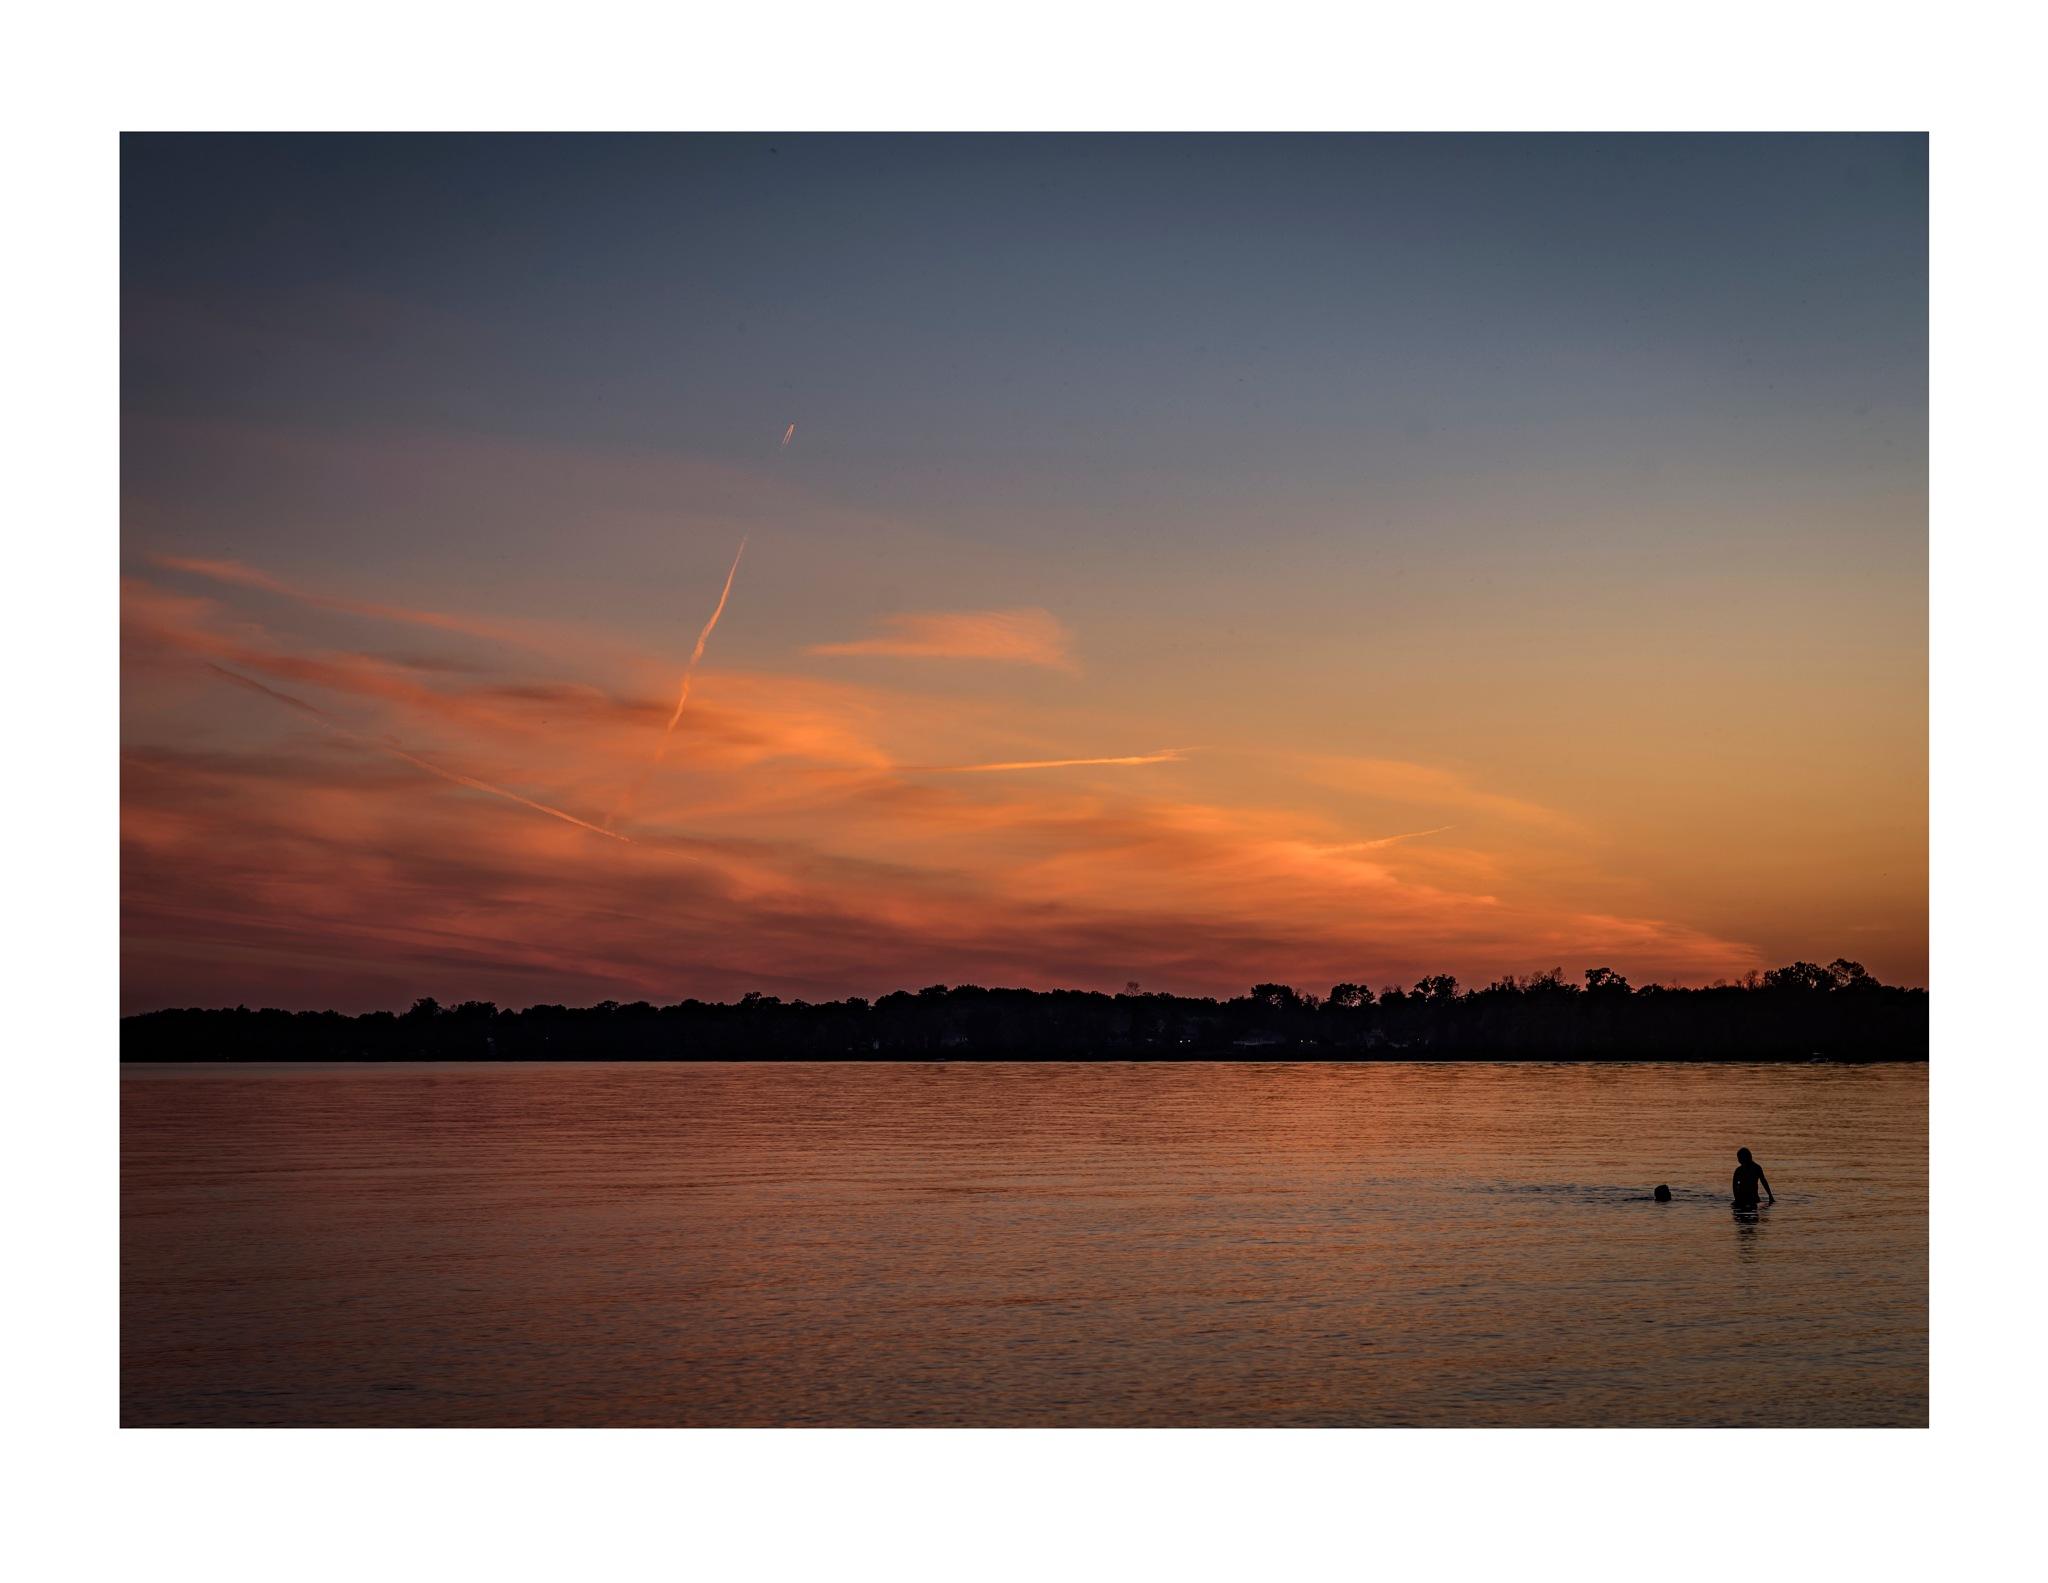 Evening Swim by jhulton